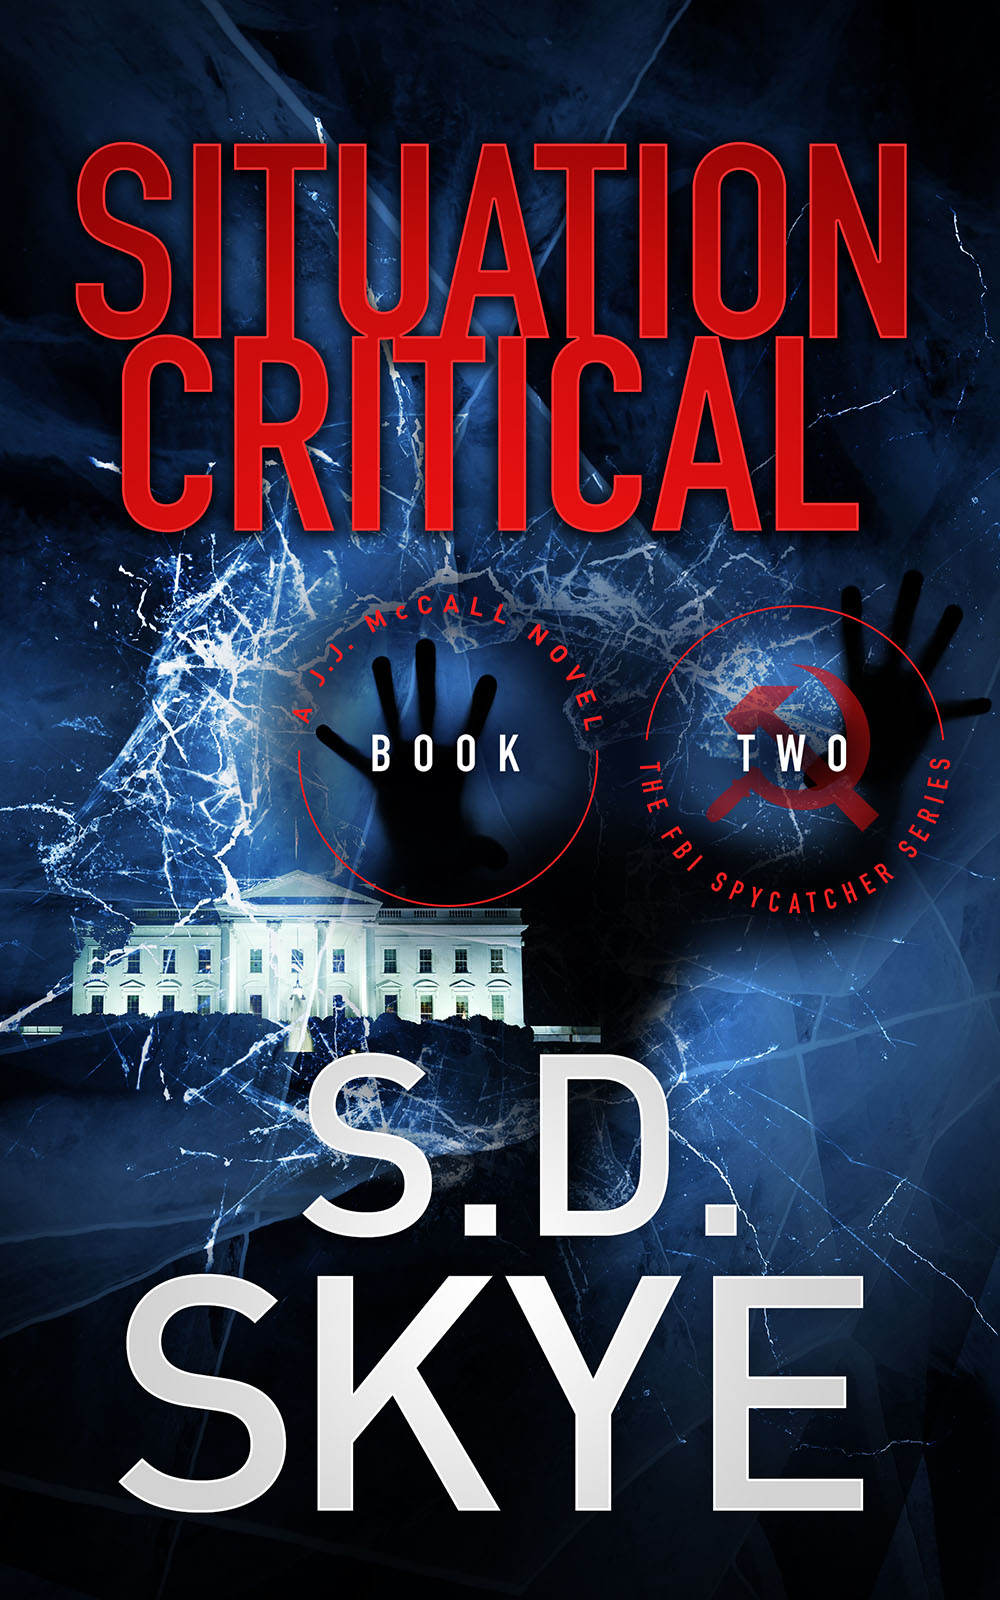 SITUATION CRITICAL (A J.J. MCCALL NOVEL #2)